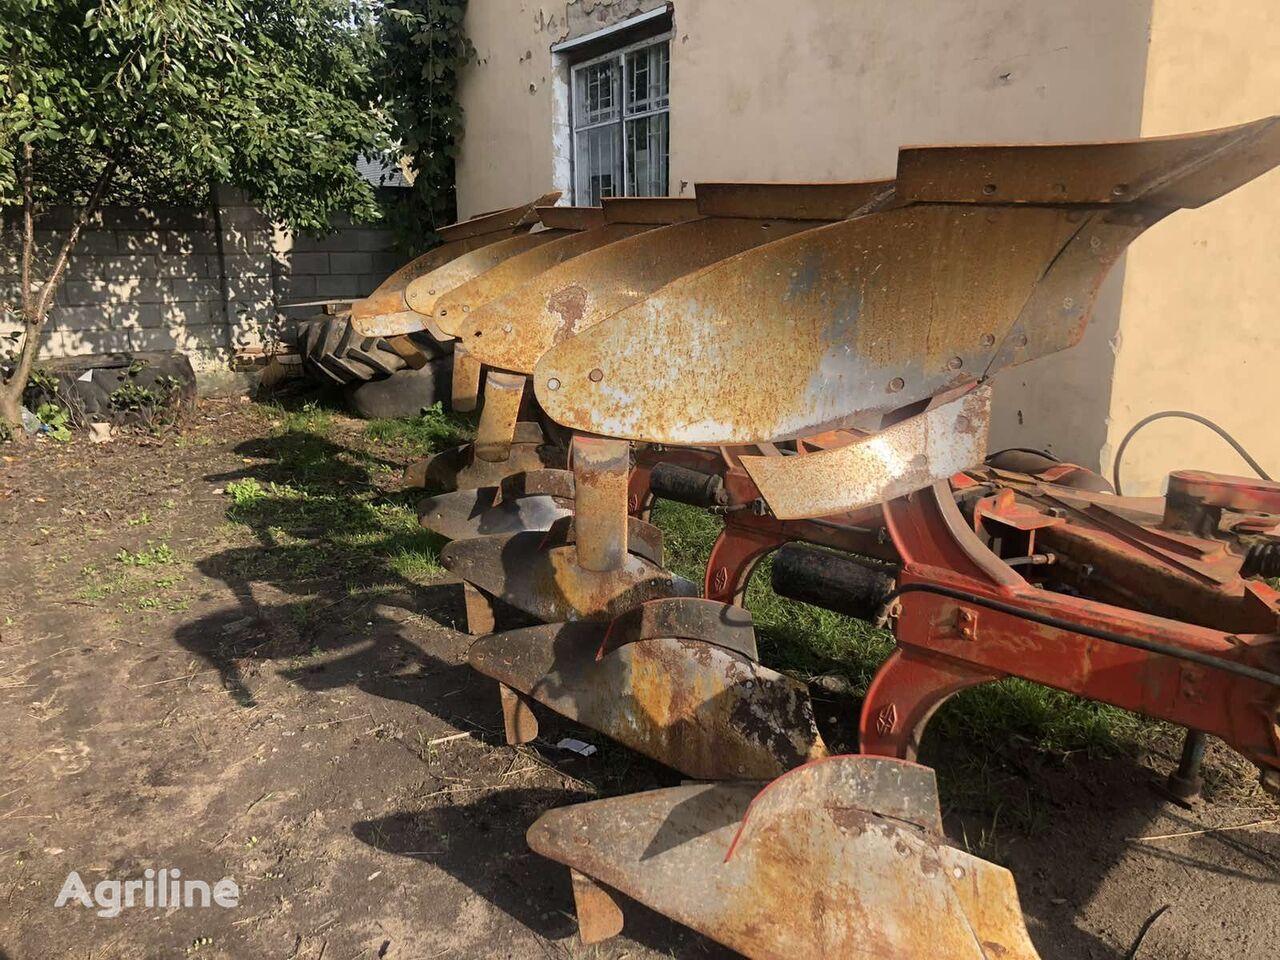 GREGOIRE BESSON RCW 5 reversible plough